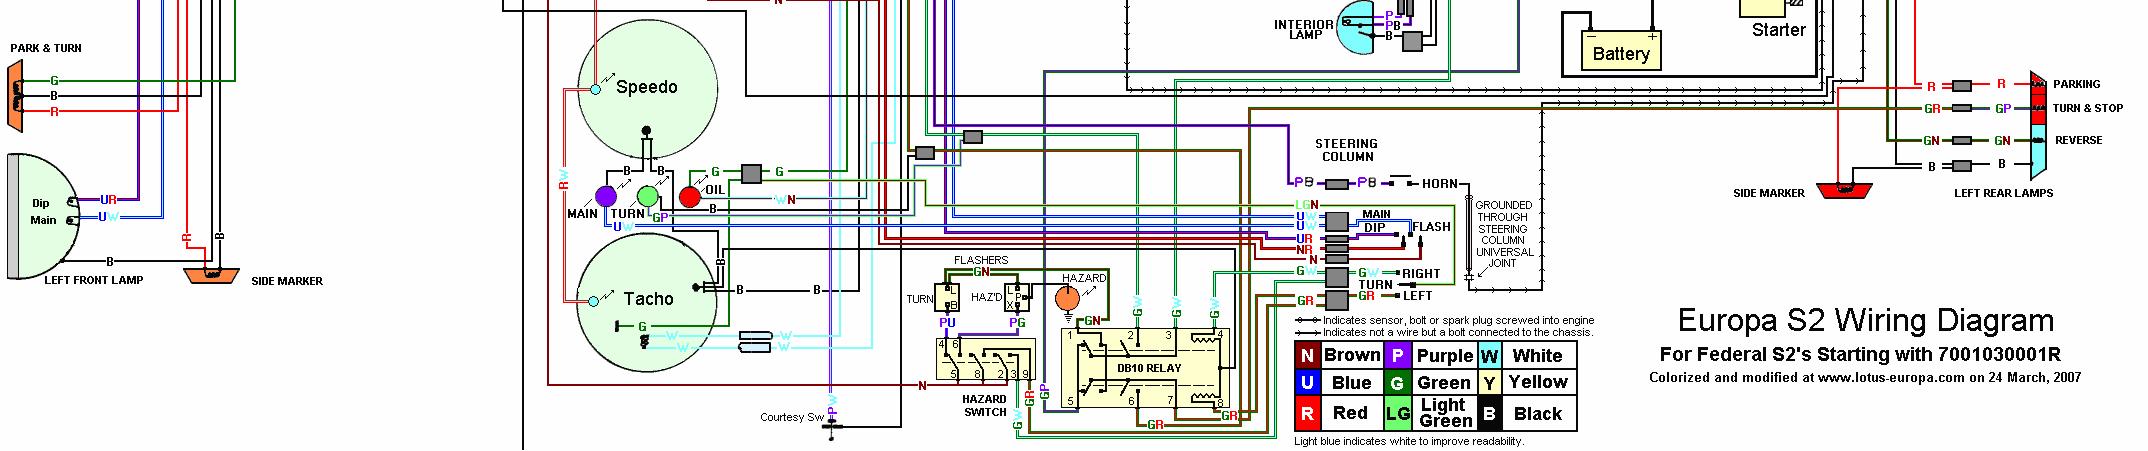 Warlock Alarm Wiring Diagram : Audiovox car alarm prestige i wiring diagram